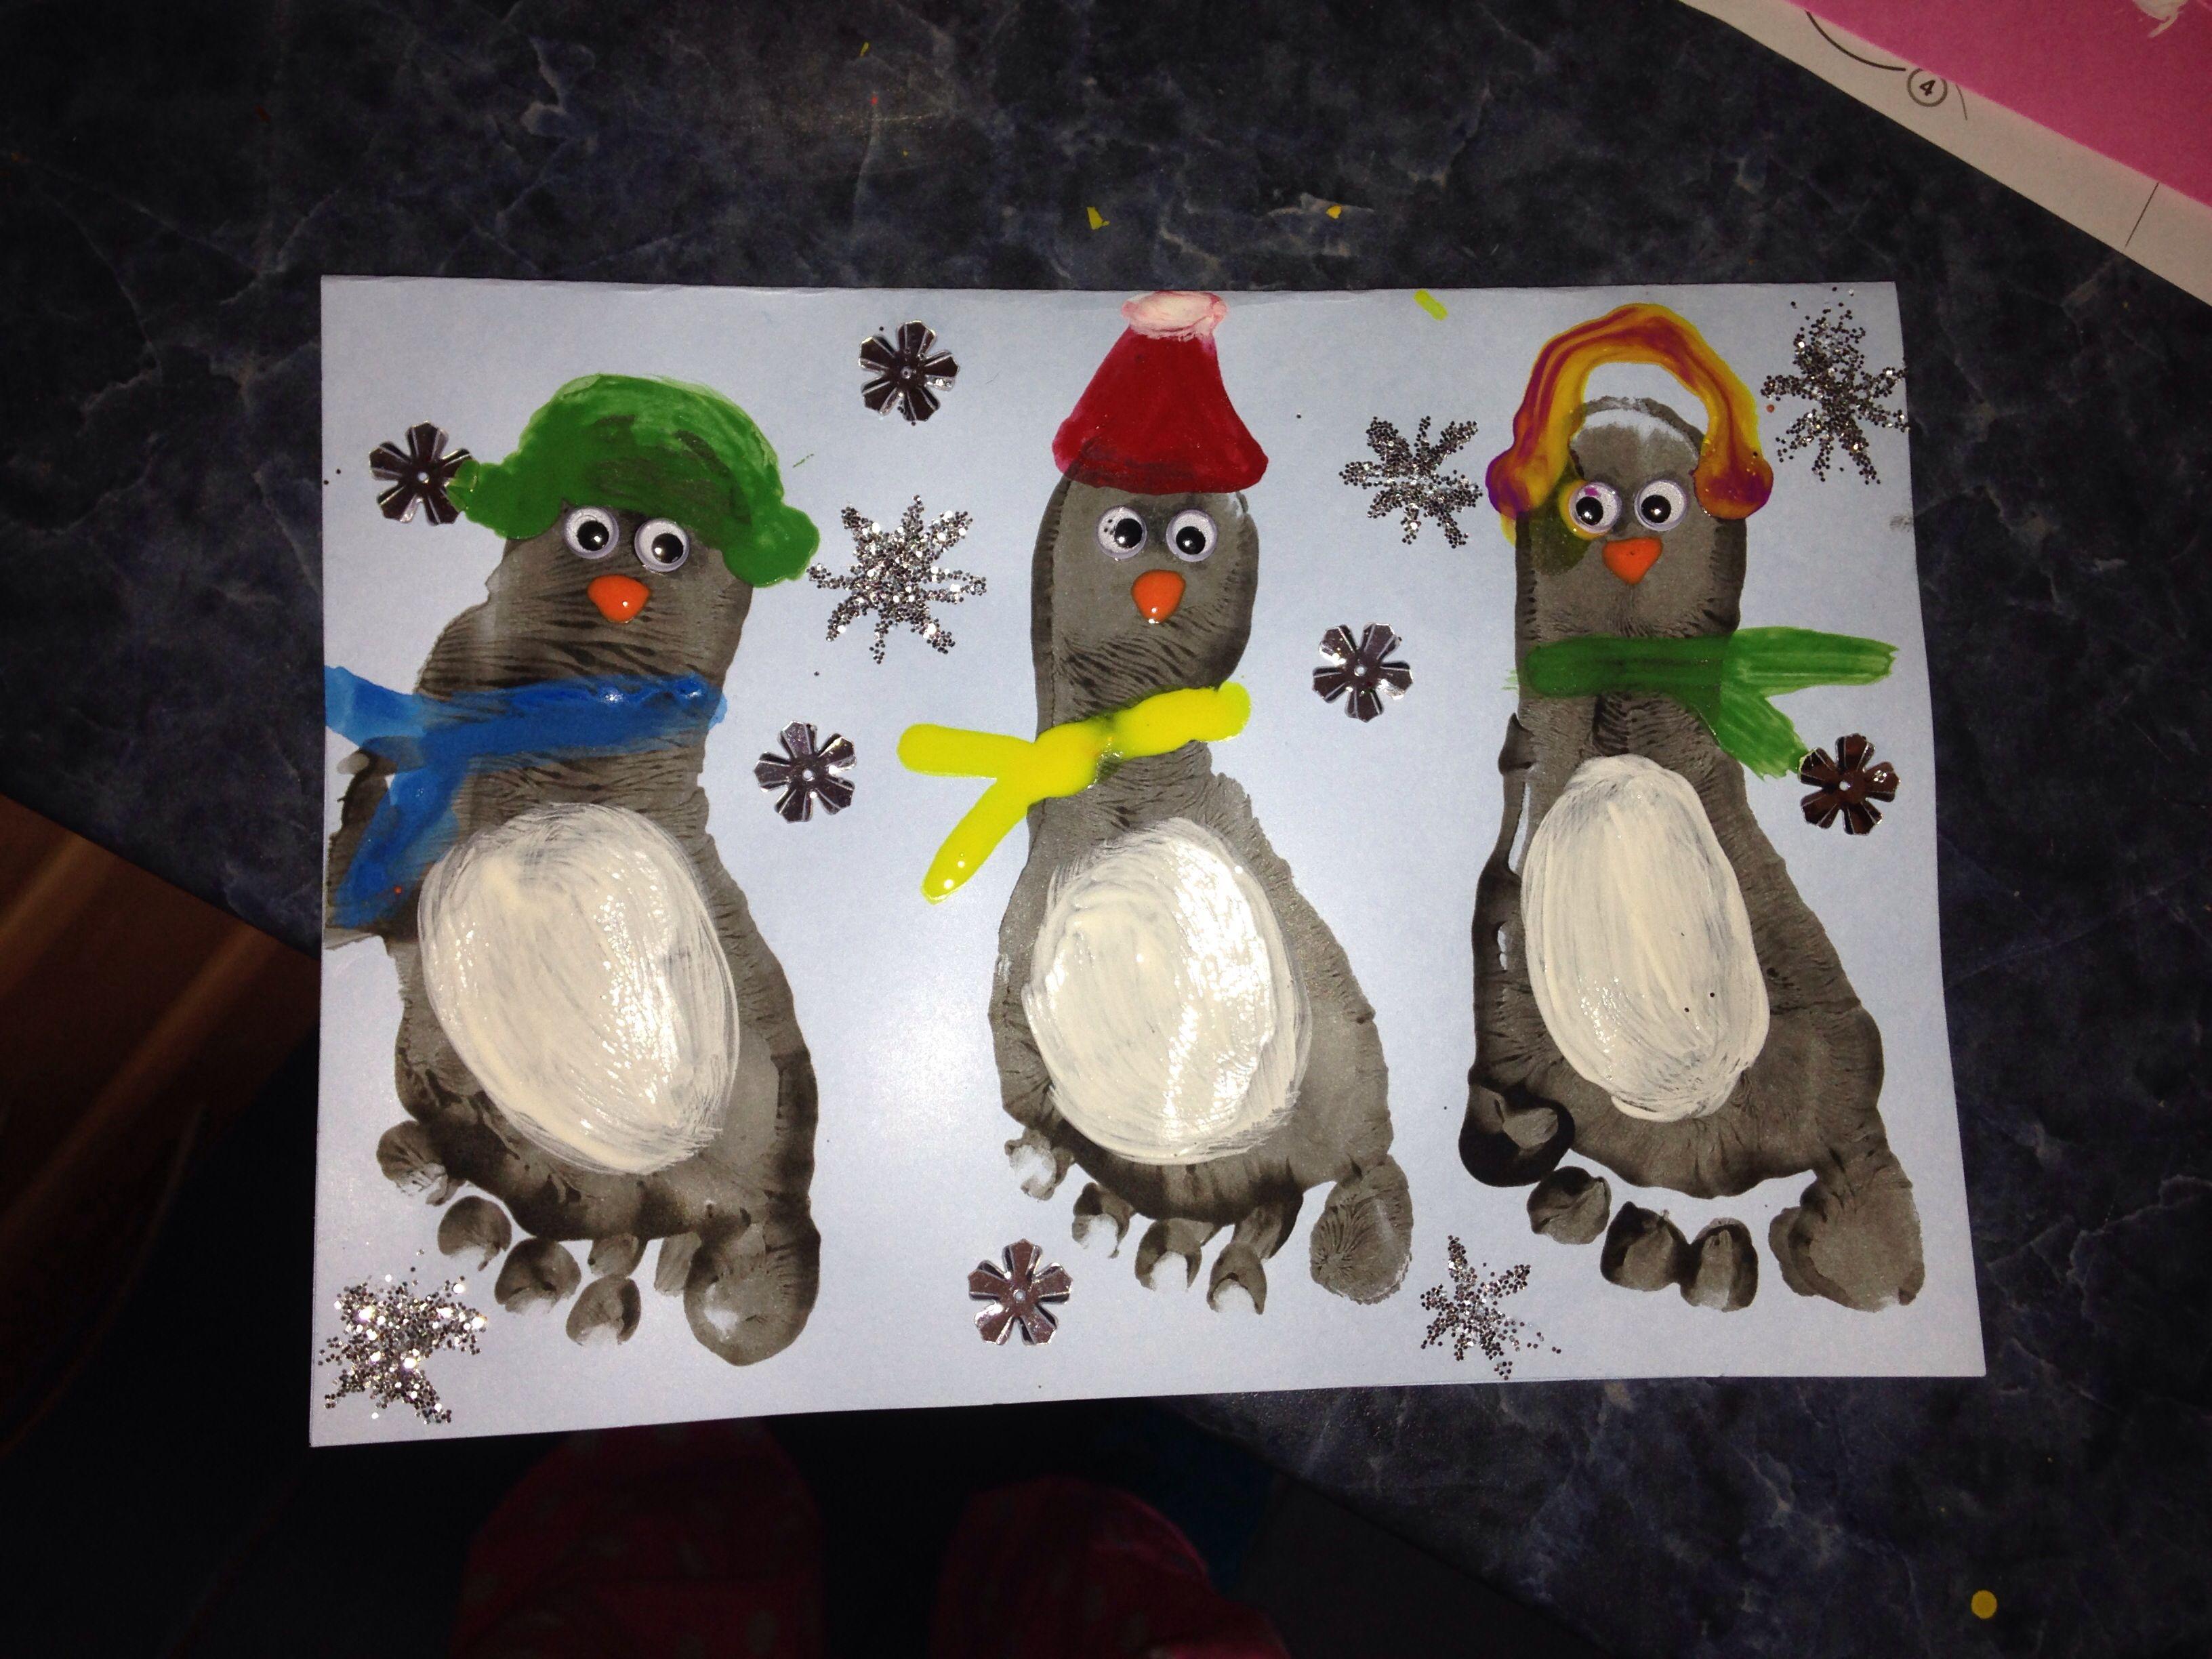 Penguin Christmas Cards Footprint.Penguin Footprint Christmas Card Christmas Ideas